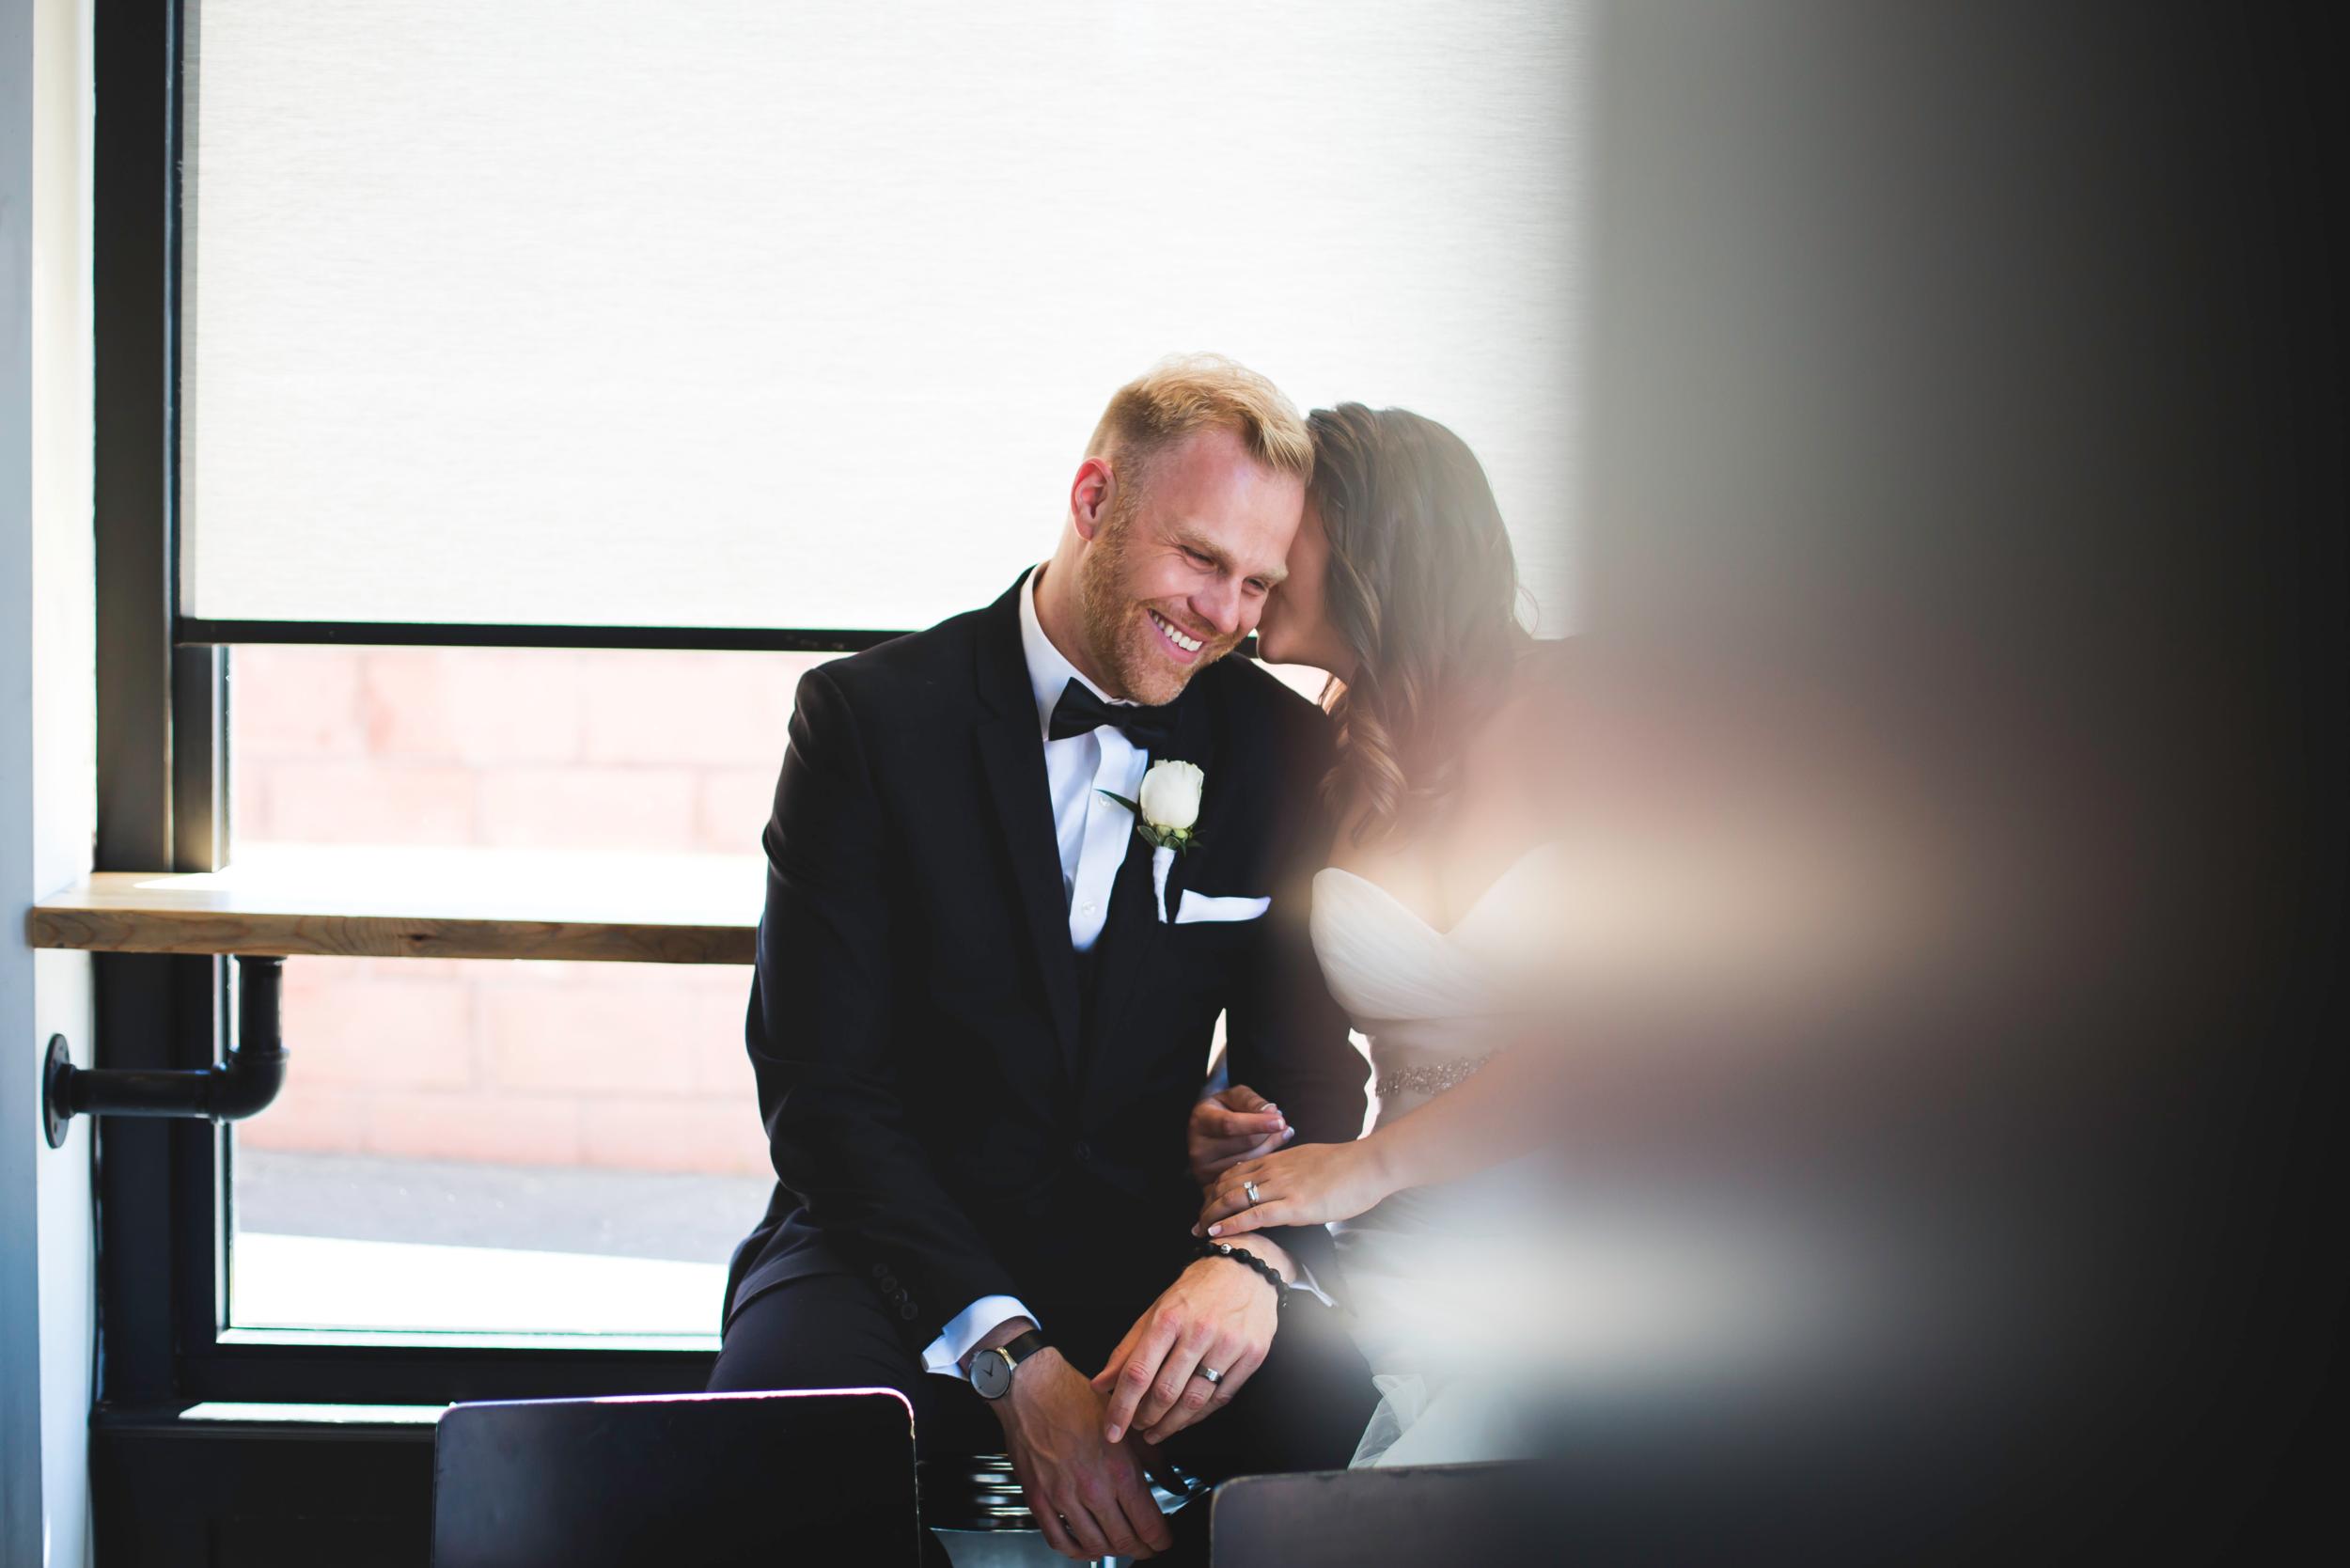 Wedding-Harbour-Banquet-Center-Oakville-Photographer-Wedding-Hamilton-Saint-James-Espresso-Downtown-HamOnt-GTA-Niagara-Toronto-Moments-by-Lauren-Photography-Photo-Image-27.png